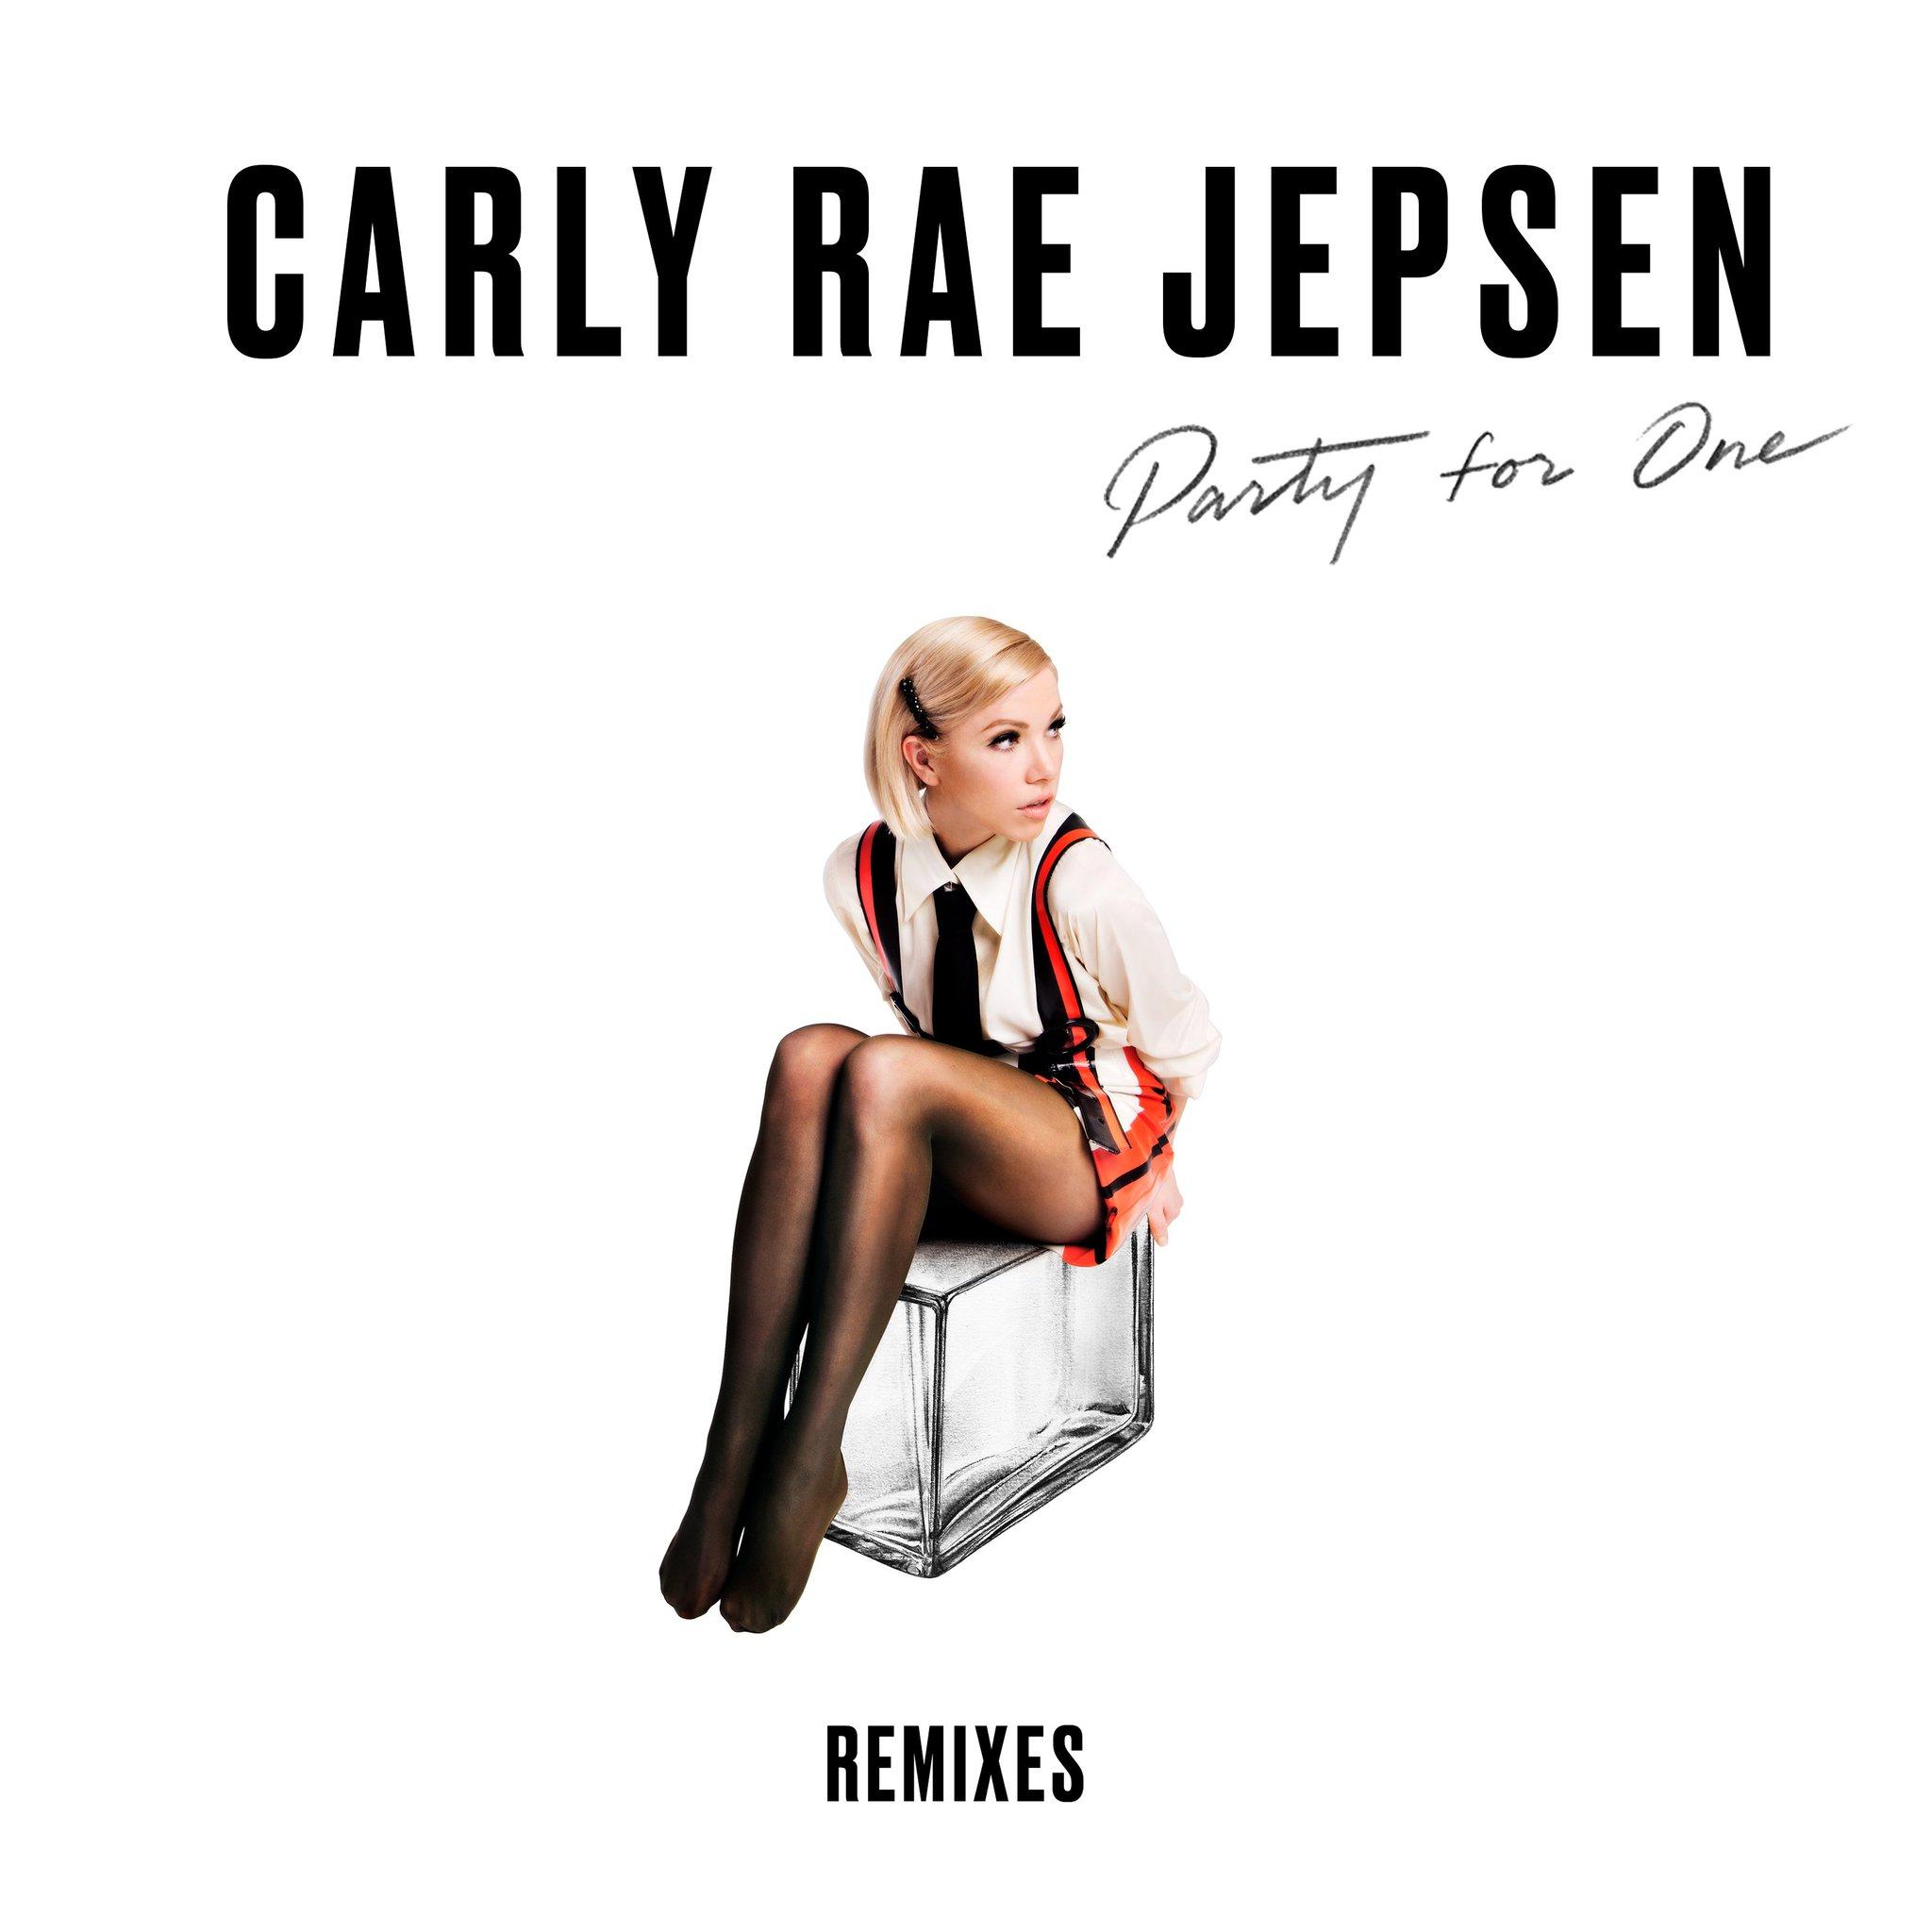 #PartyForOne remixes by the fab @ankimusic, @sawyrmusic & @moregiraffesplz ��  https://t.co/Y2c3yVTvEM https://t.co/gQunr37tru